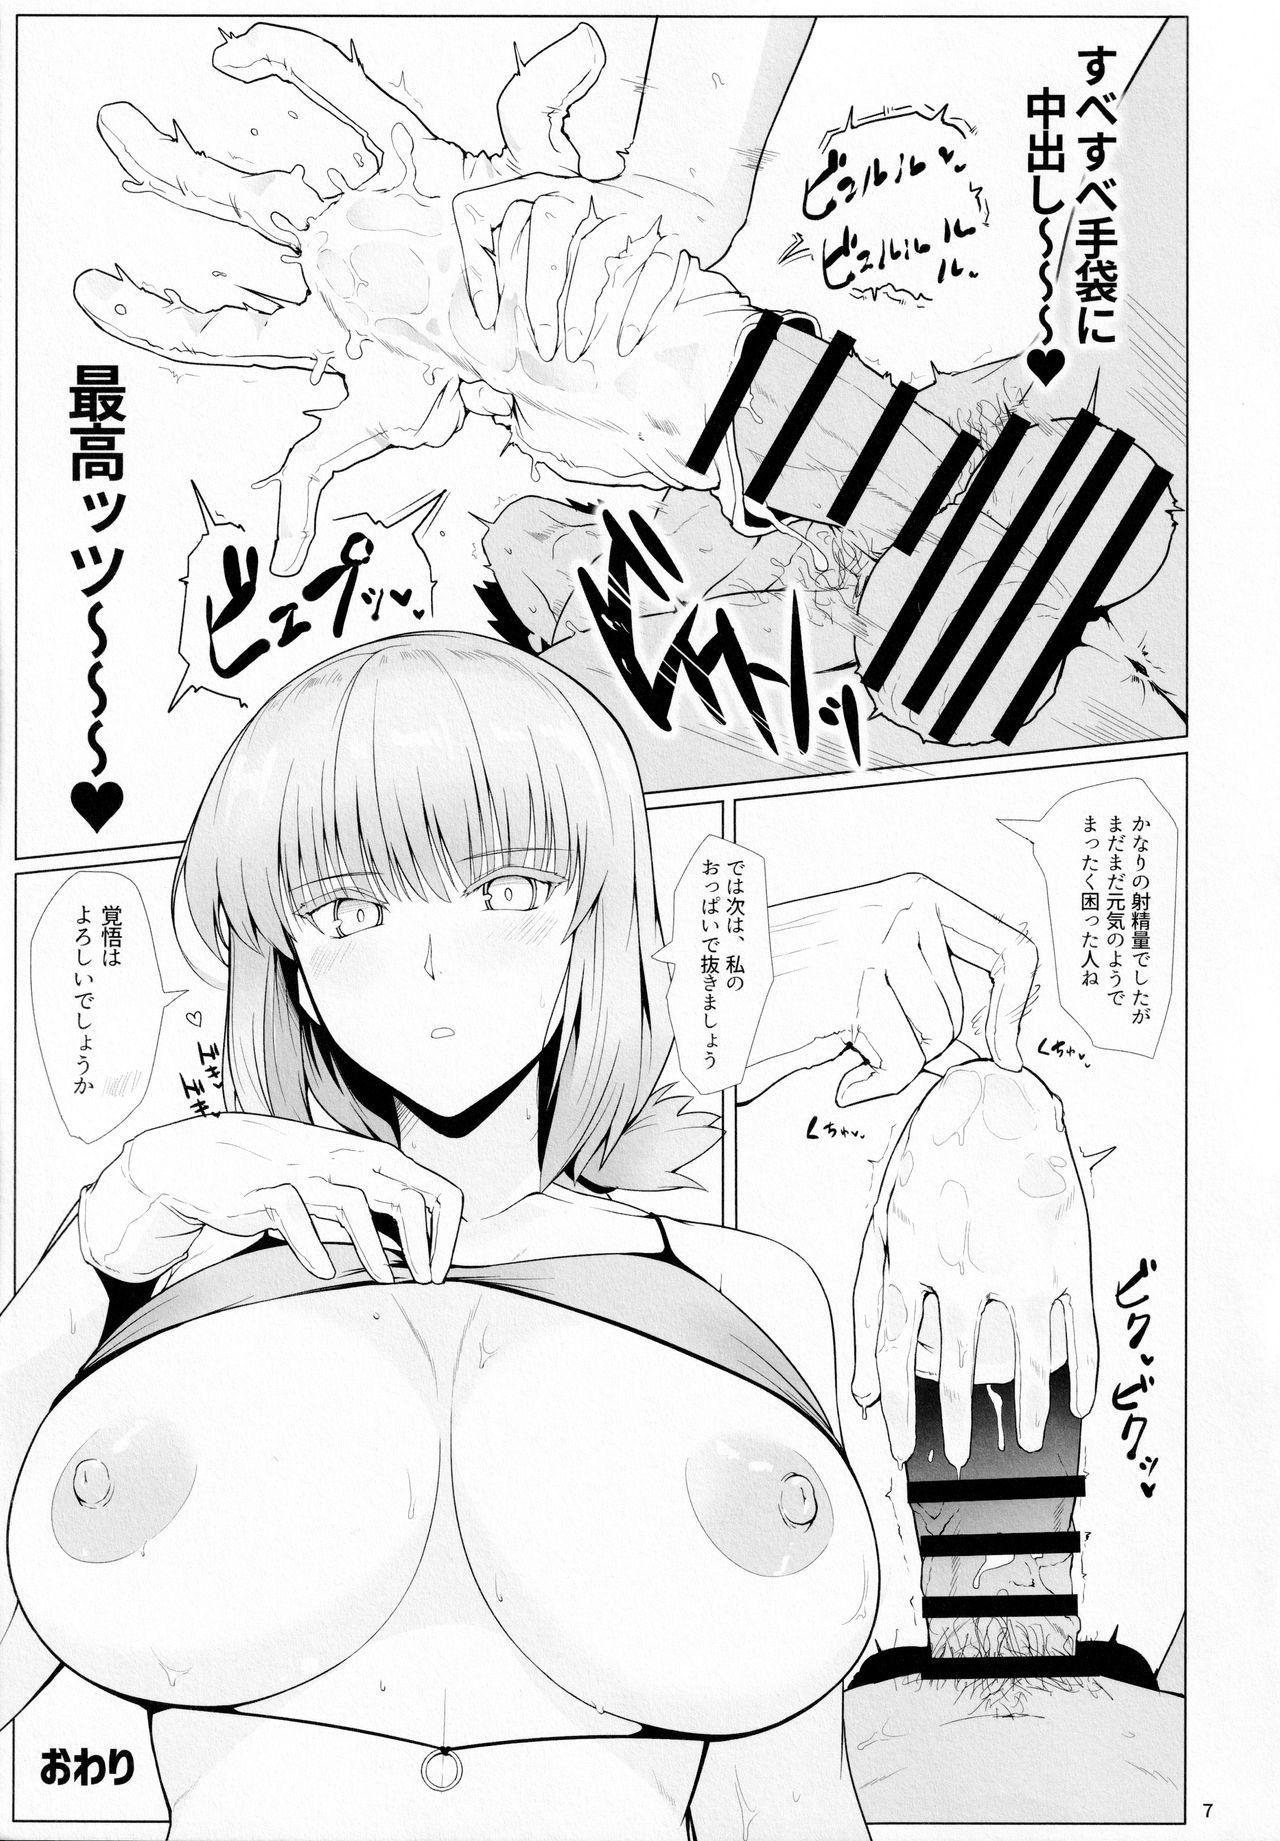 Chaldea Shiko Shiko Material Vol. 1 5